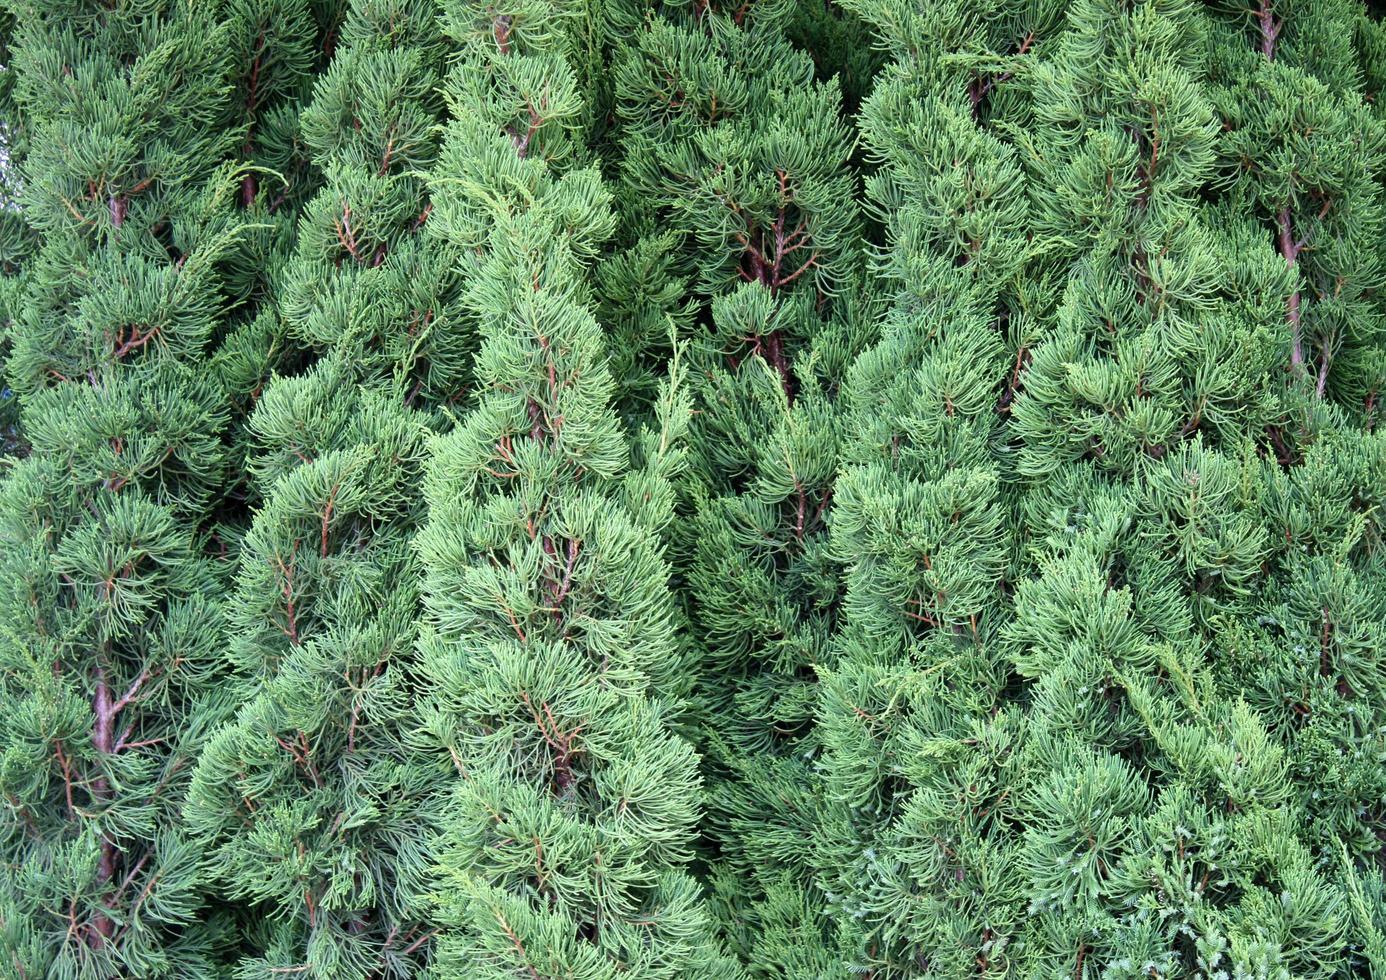 pianta sempreverde verde foto